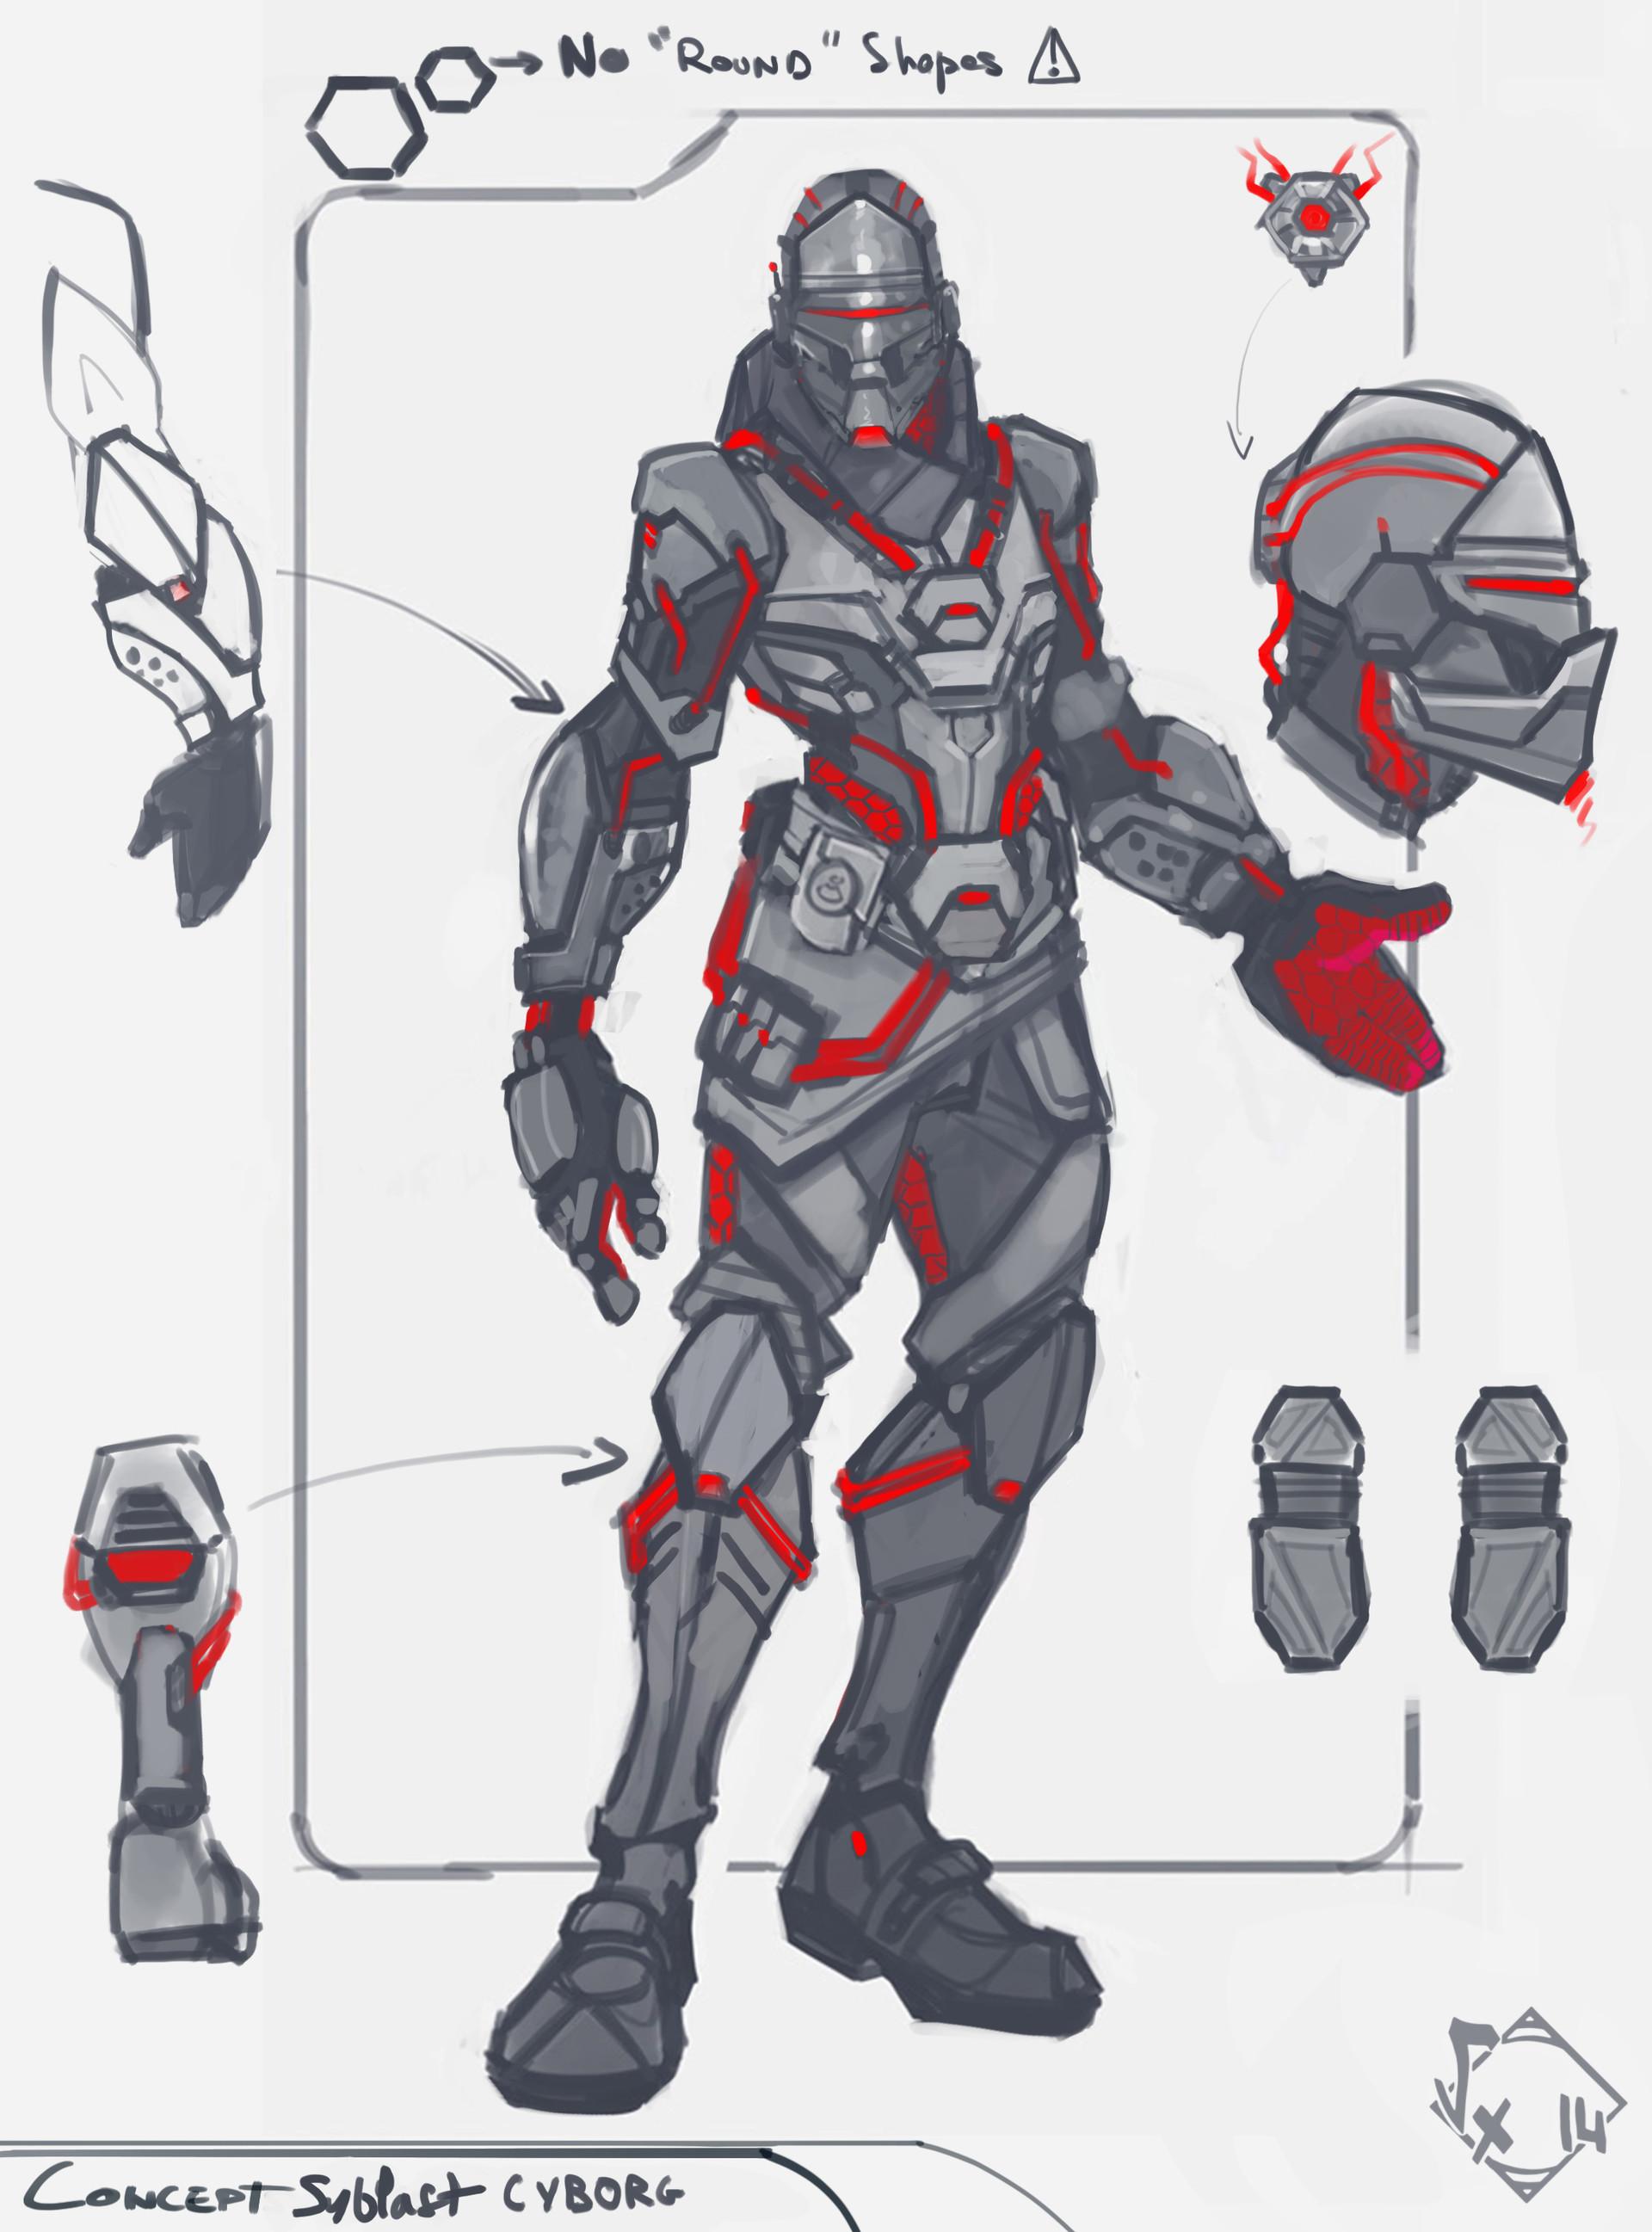 Etienne beschet wip cyborg 01 conceptart 01